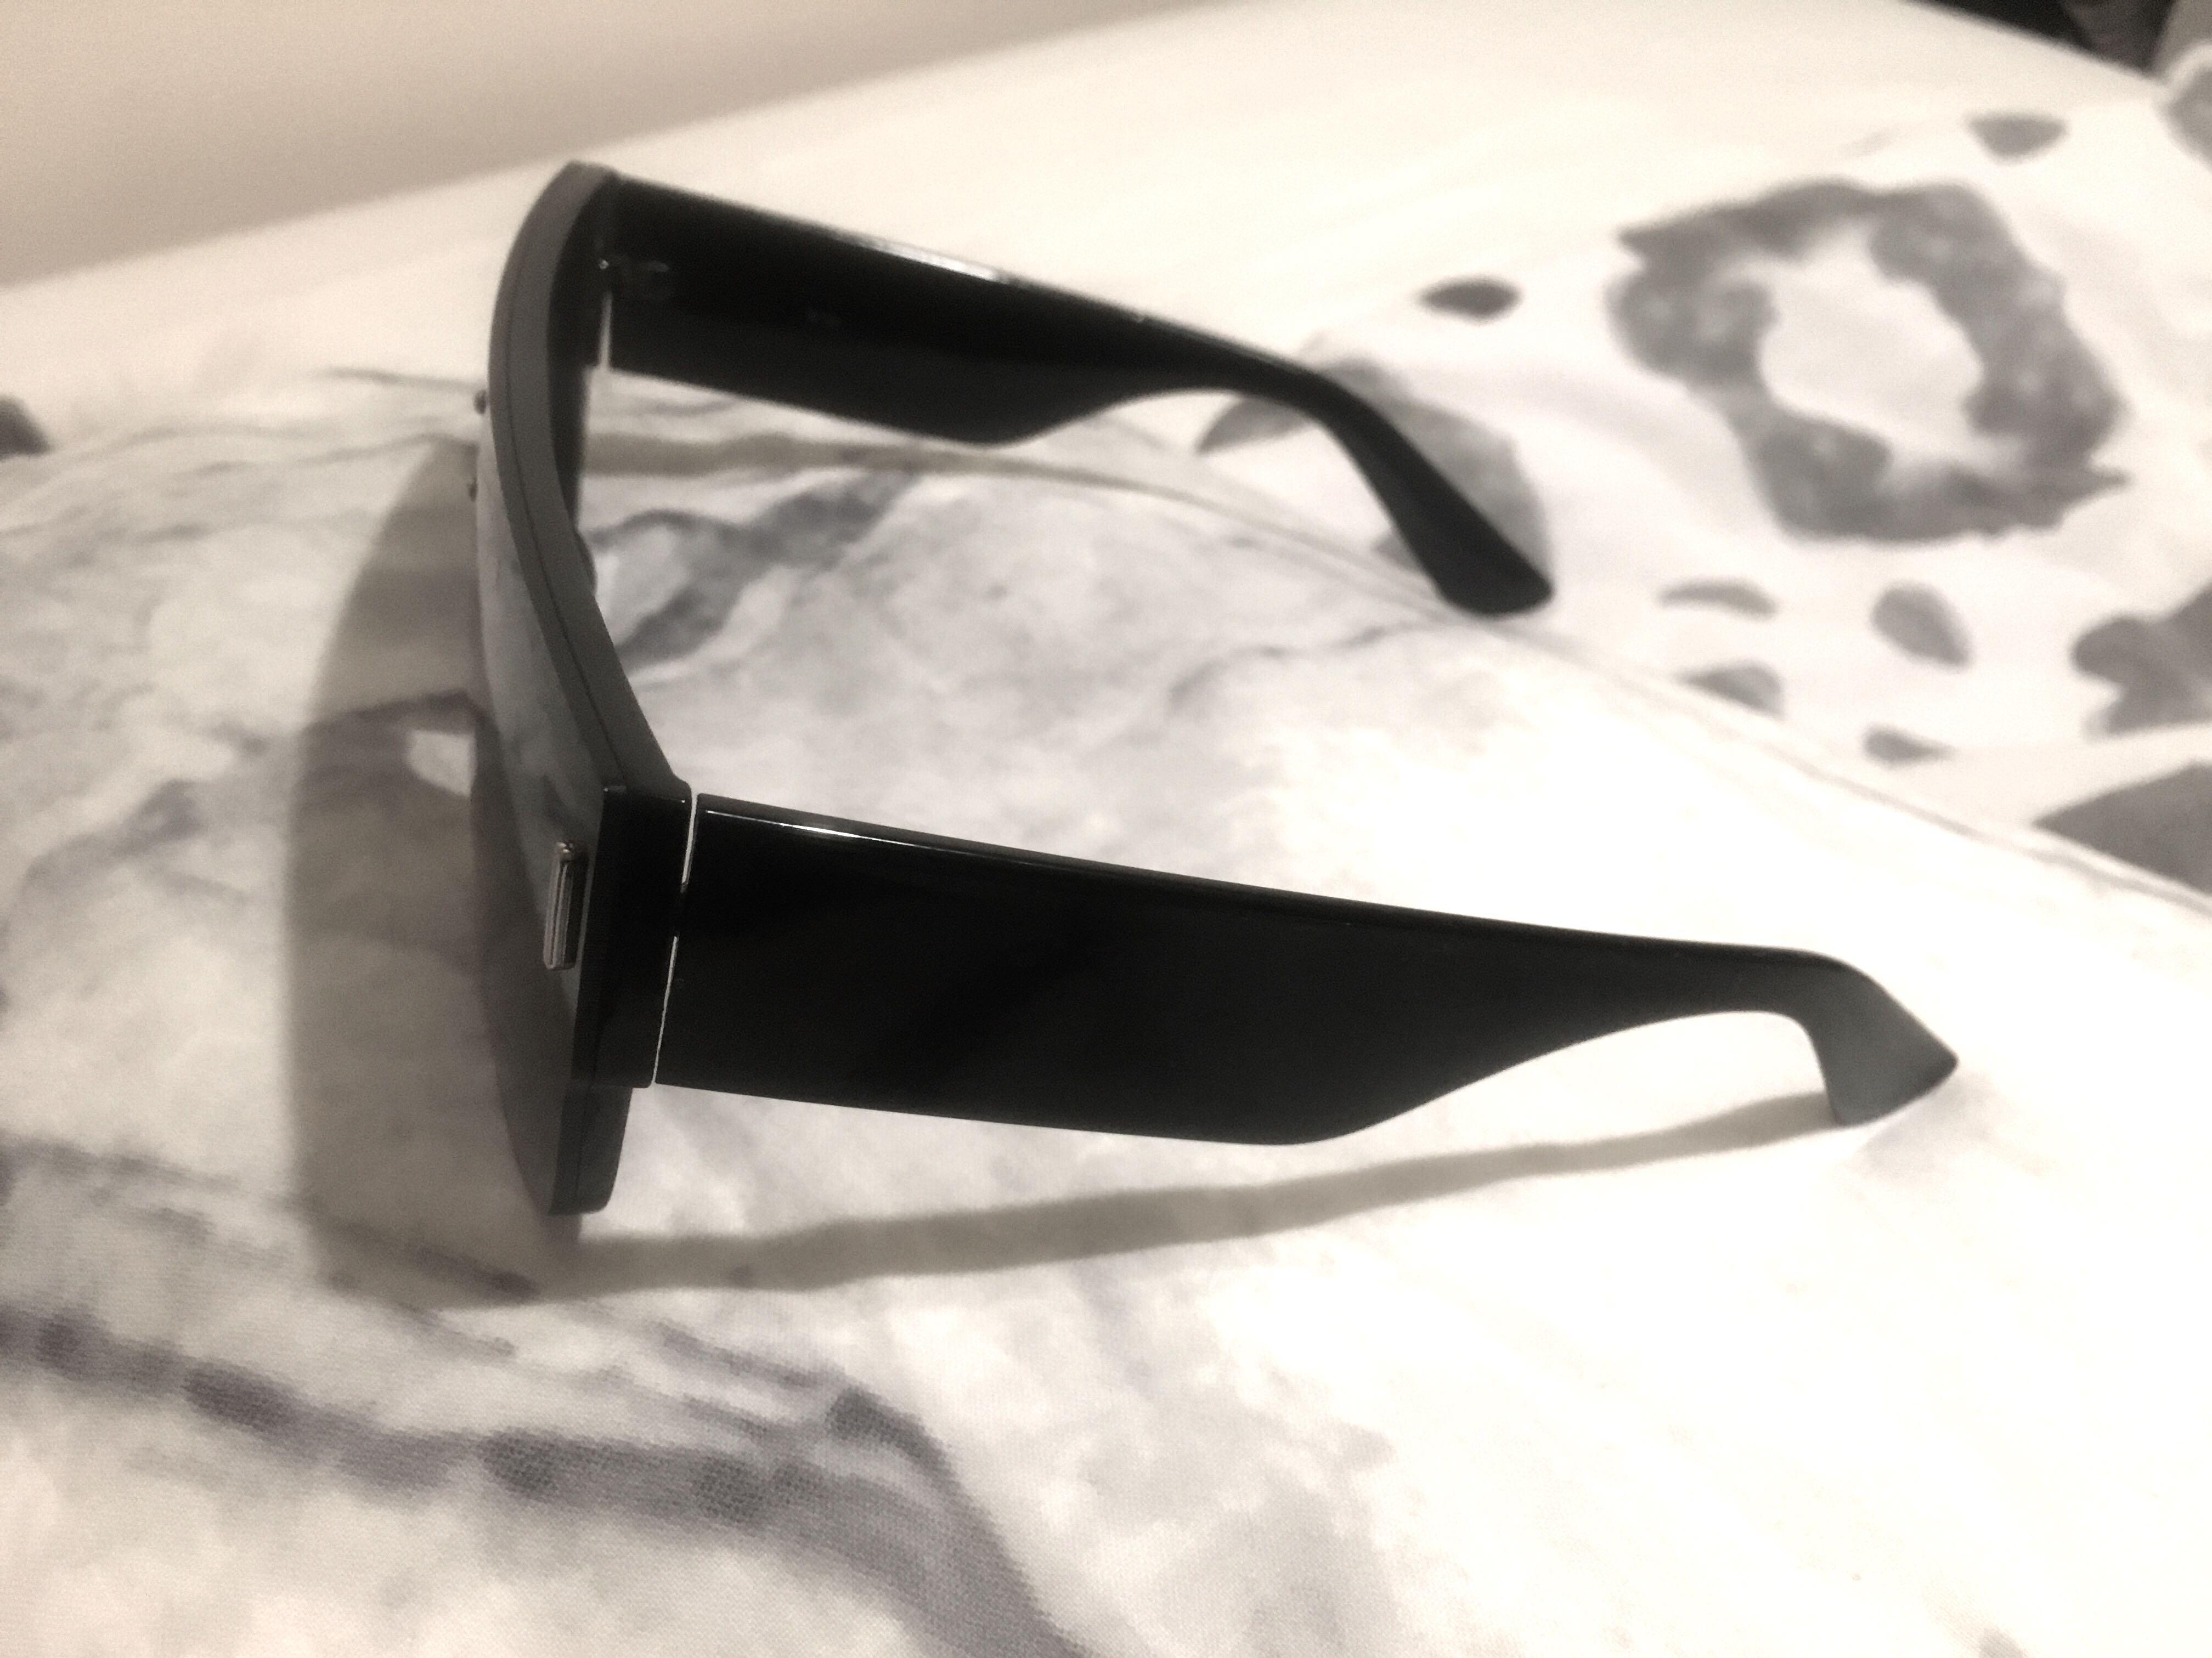 QUAY, minkpink, showpo and more Assorted women's sunglasses